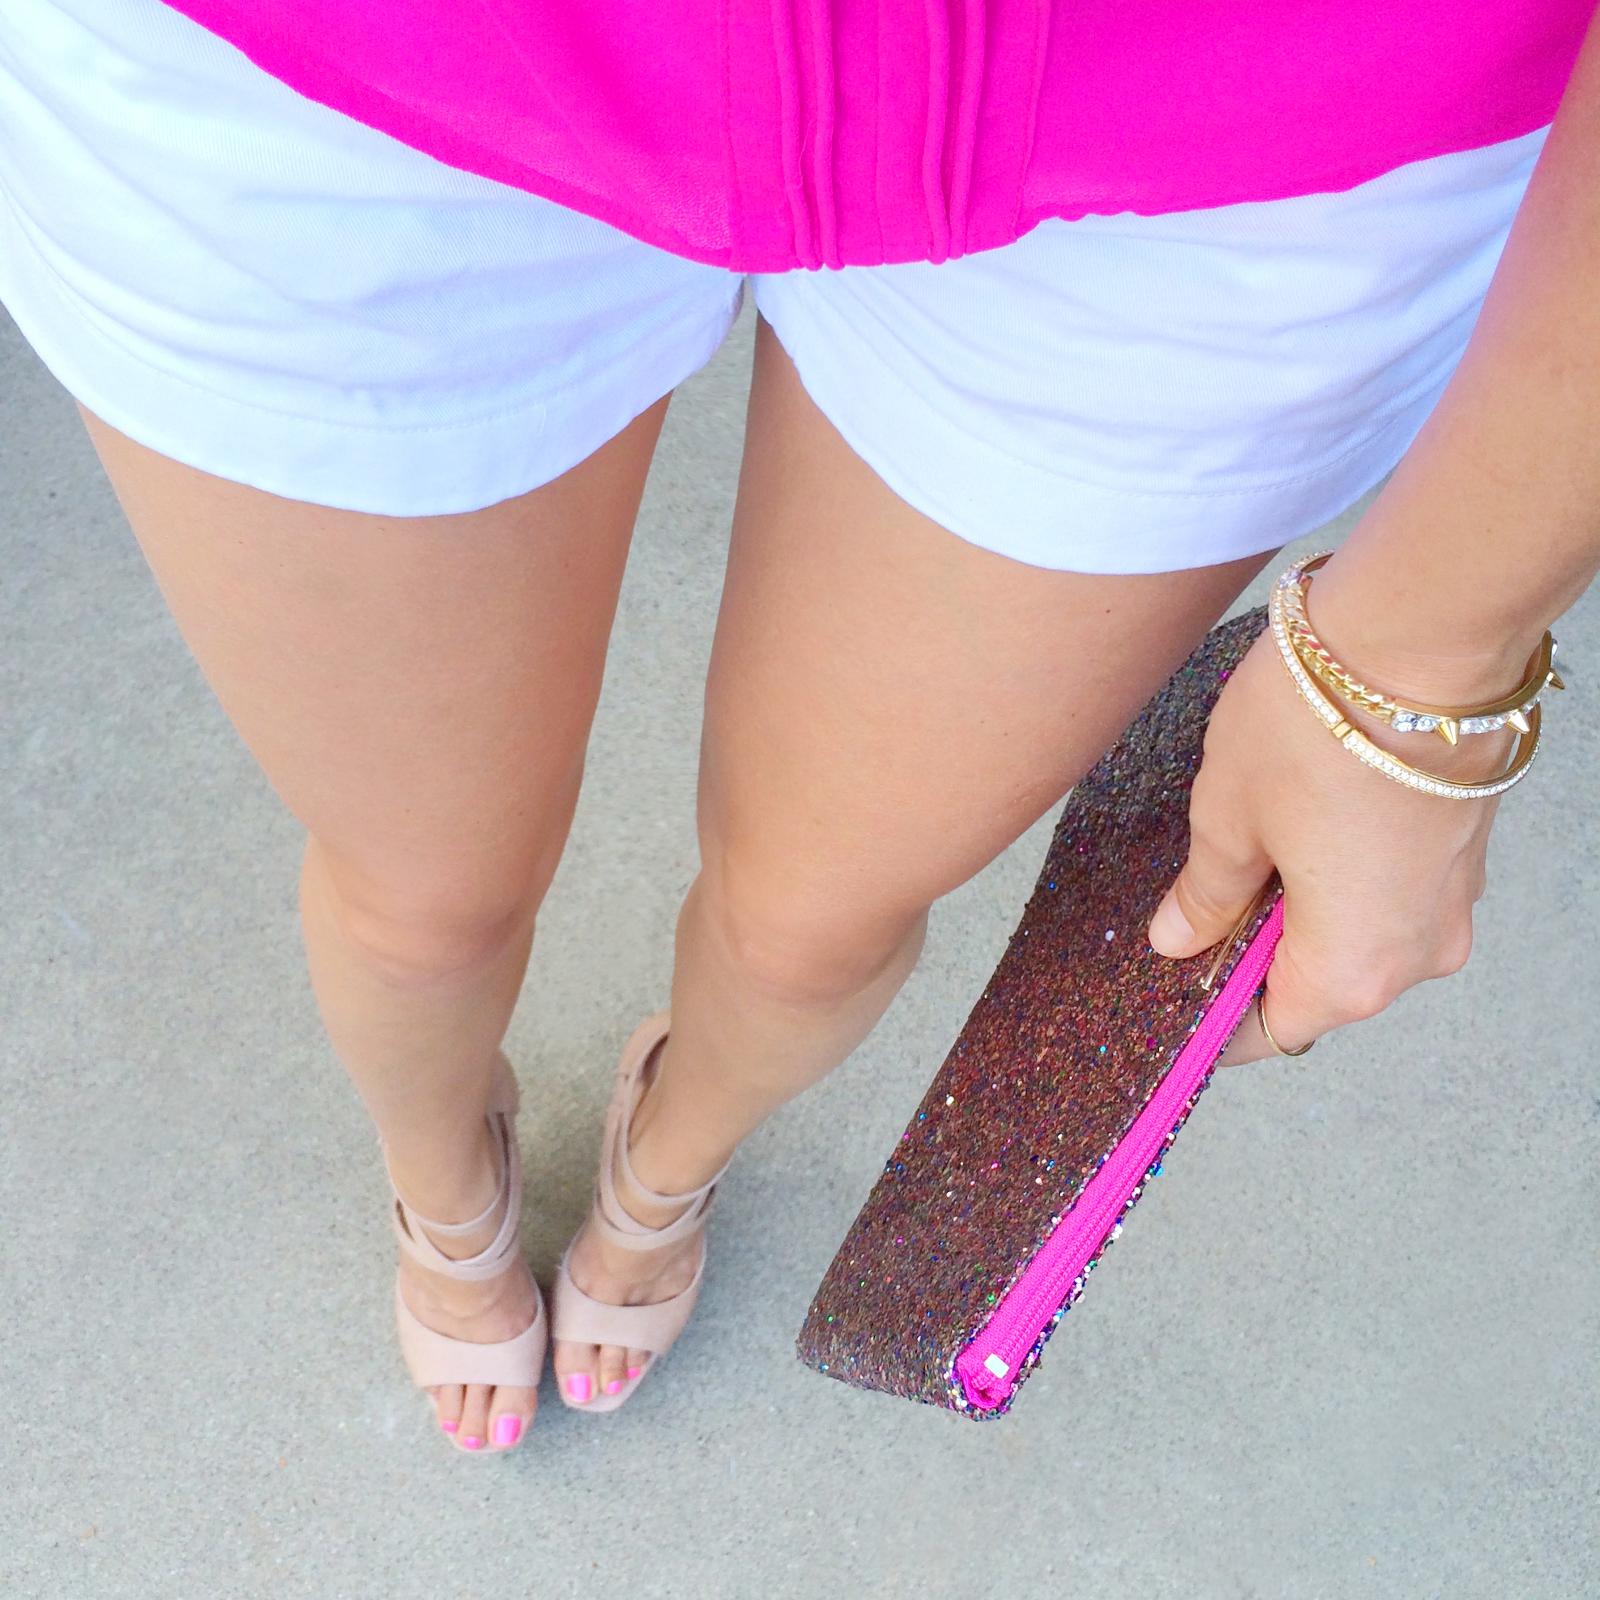 Jcrew white shorts, Alice & Olivia Heels, Kate Spade sparkle handbag